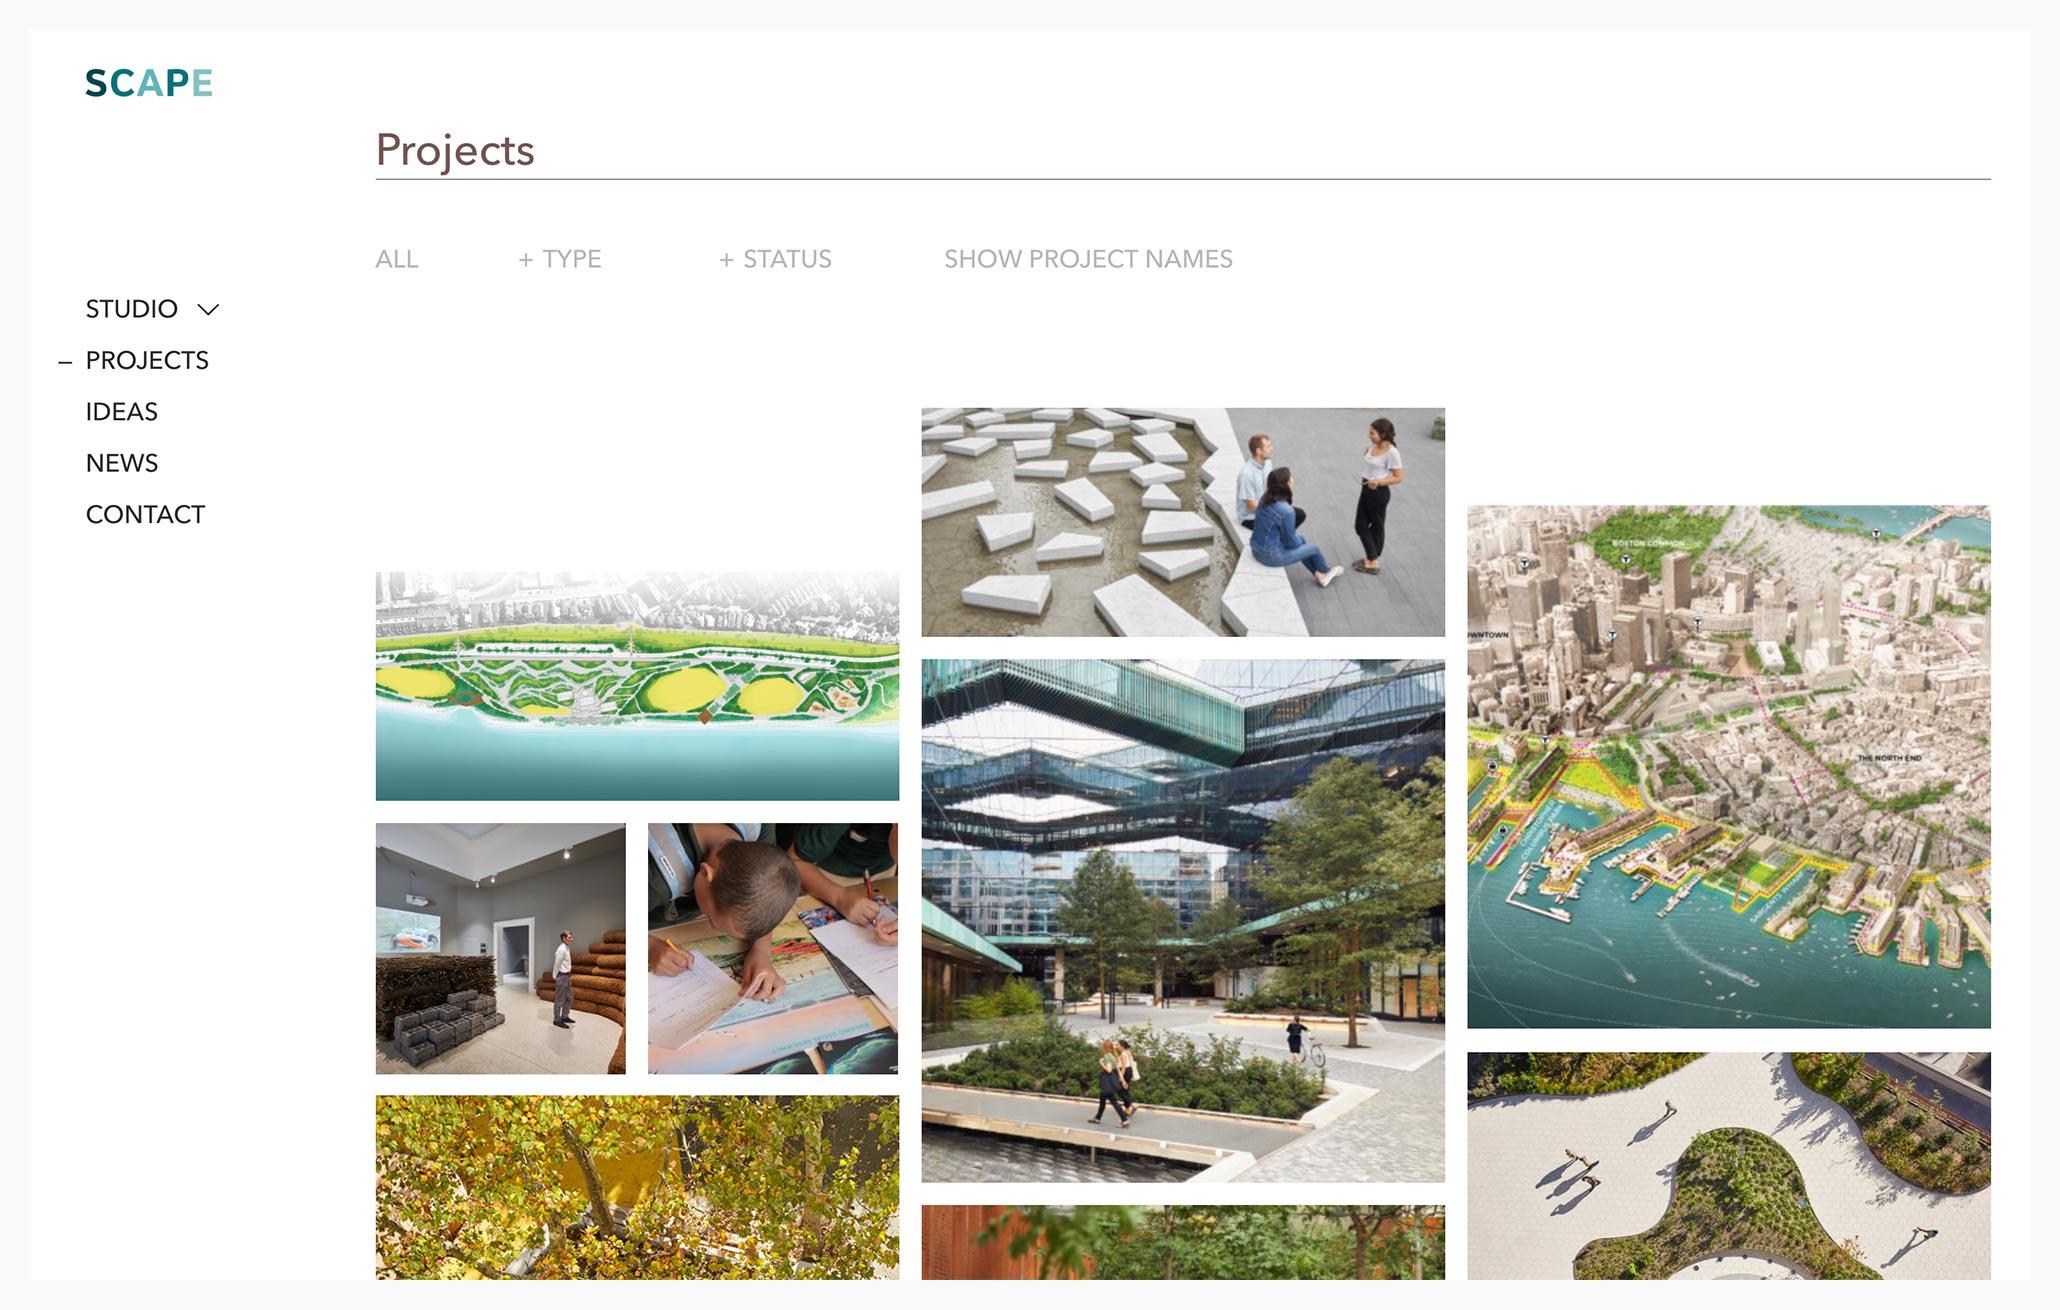 Scape Studio - Best Architecture Website of 2019